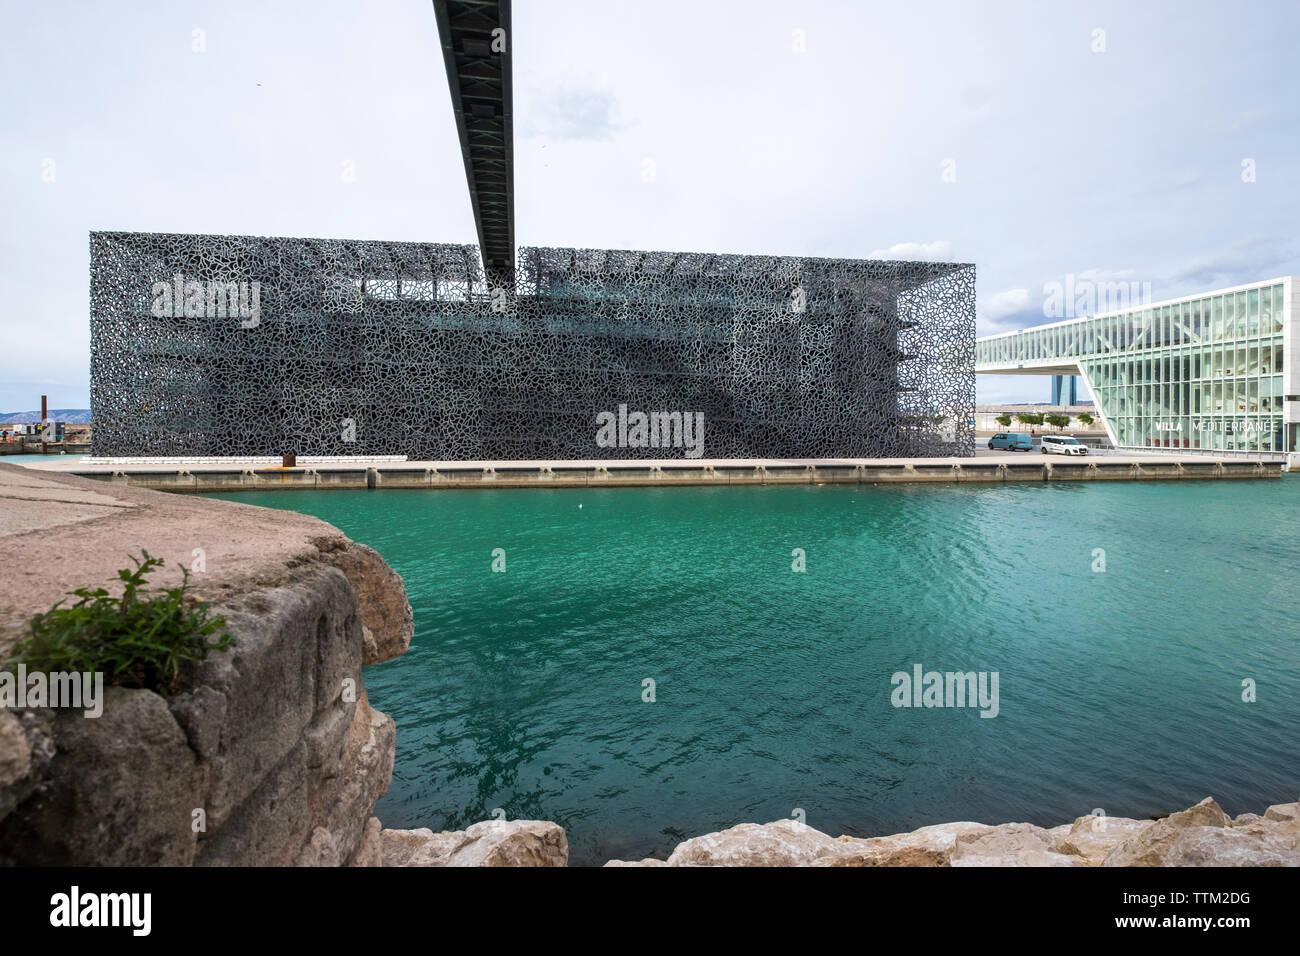 Museum of European and Mediterranean Civilisations and Villa Mediterranean against sky - Stock Image